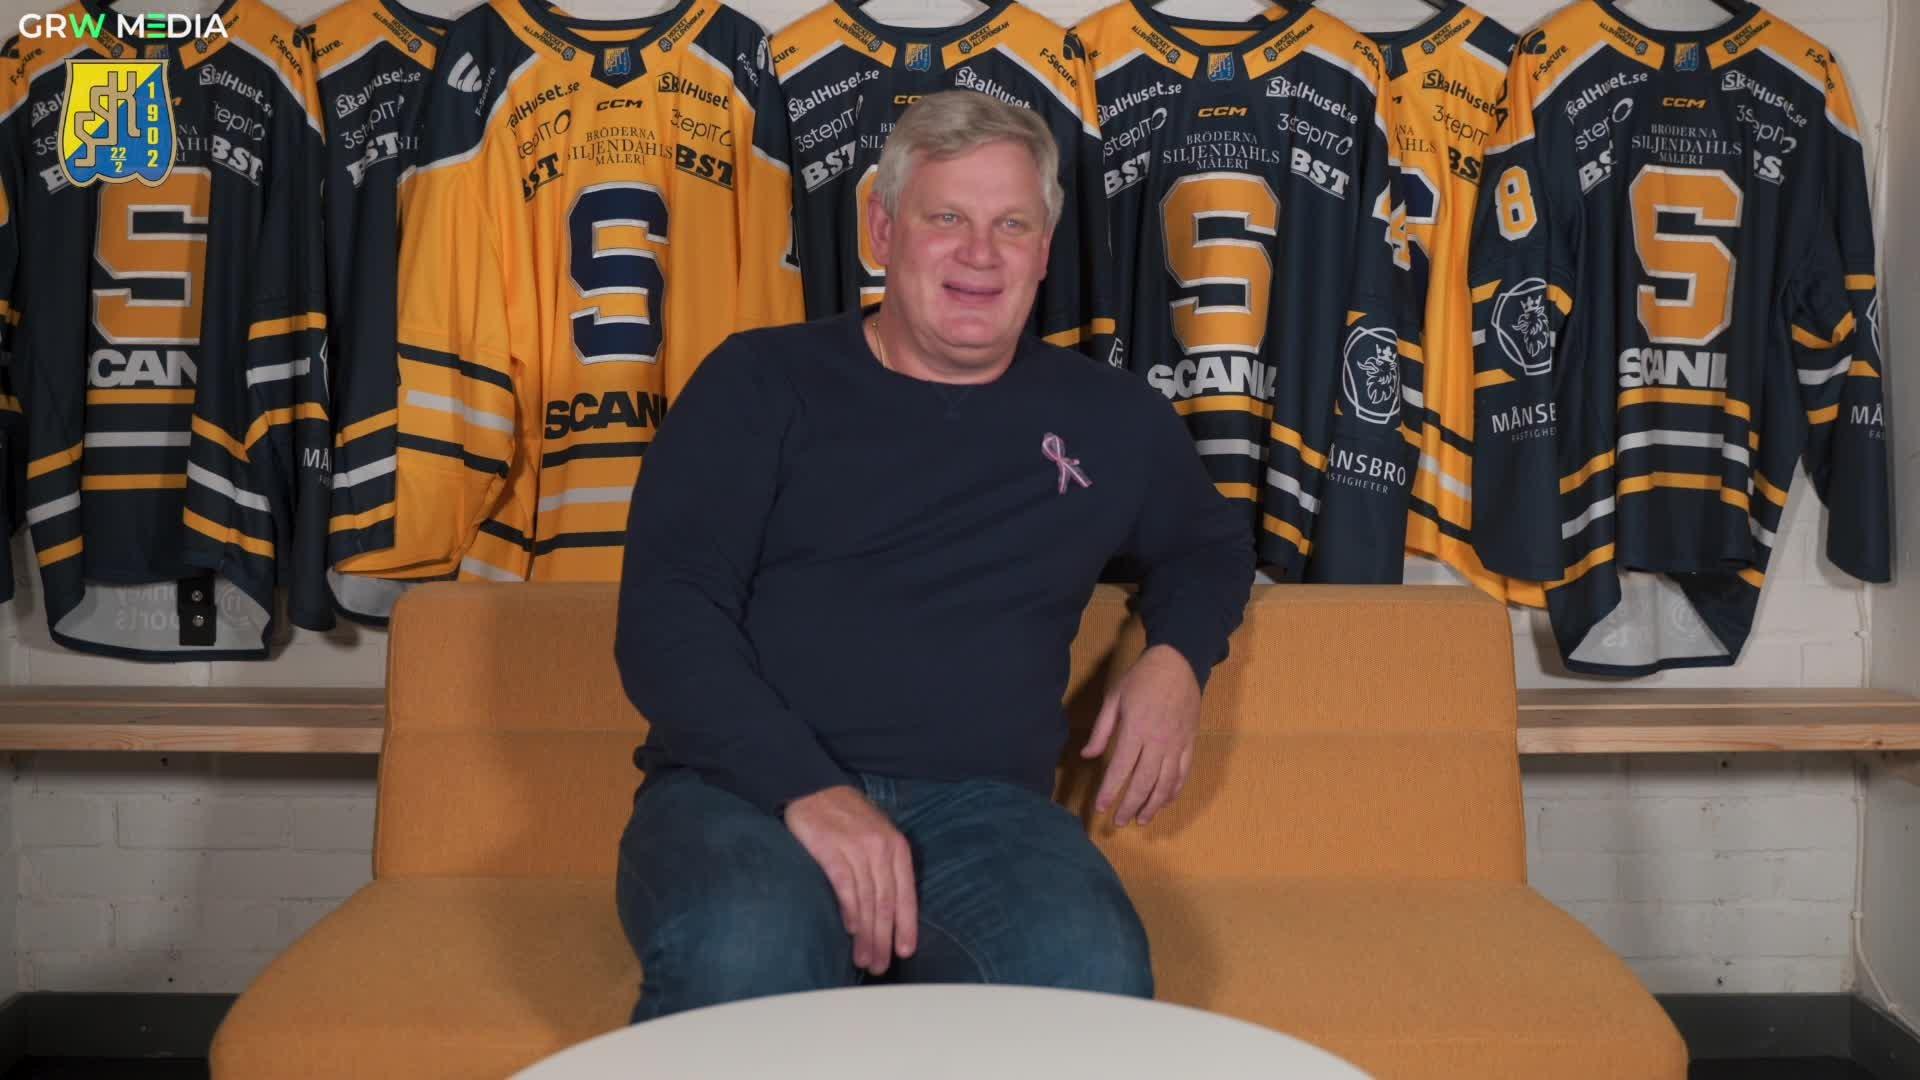 Intervju med klubbdirektör Robban Anderssonon